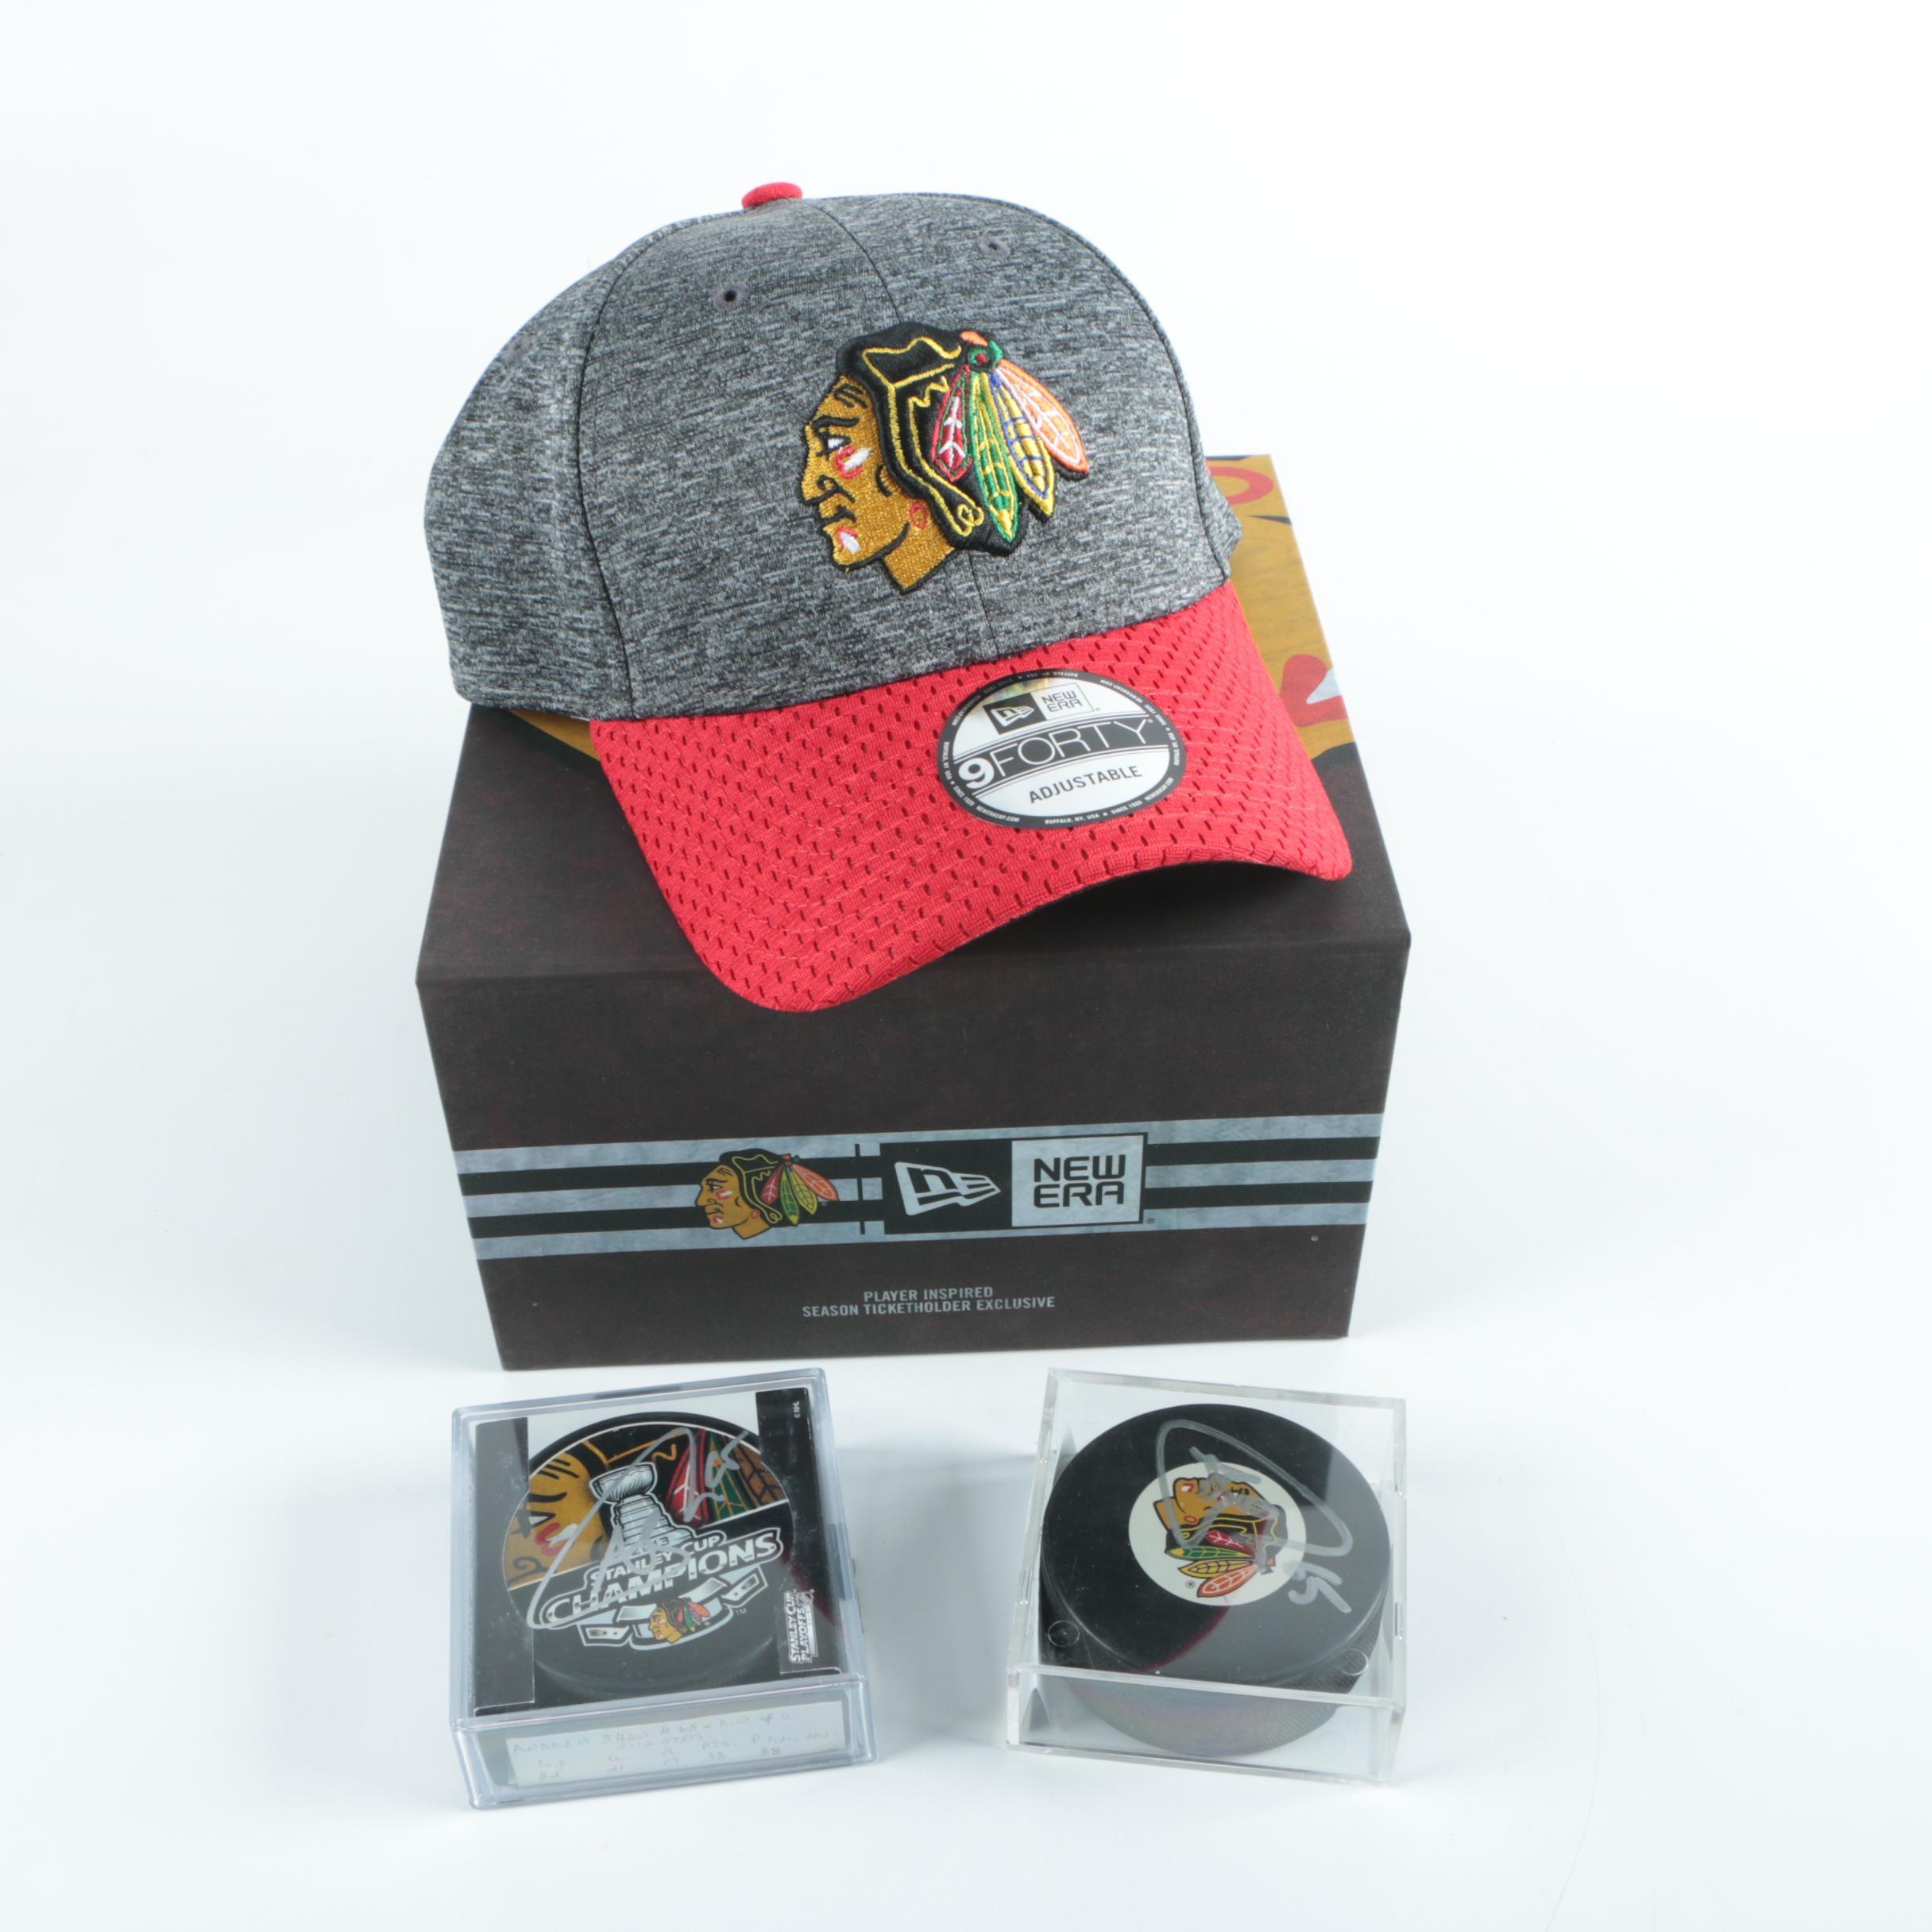 Autographed Andrew Shaw Chicago Blackhawks Pucks with Blackhawks Hat